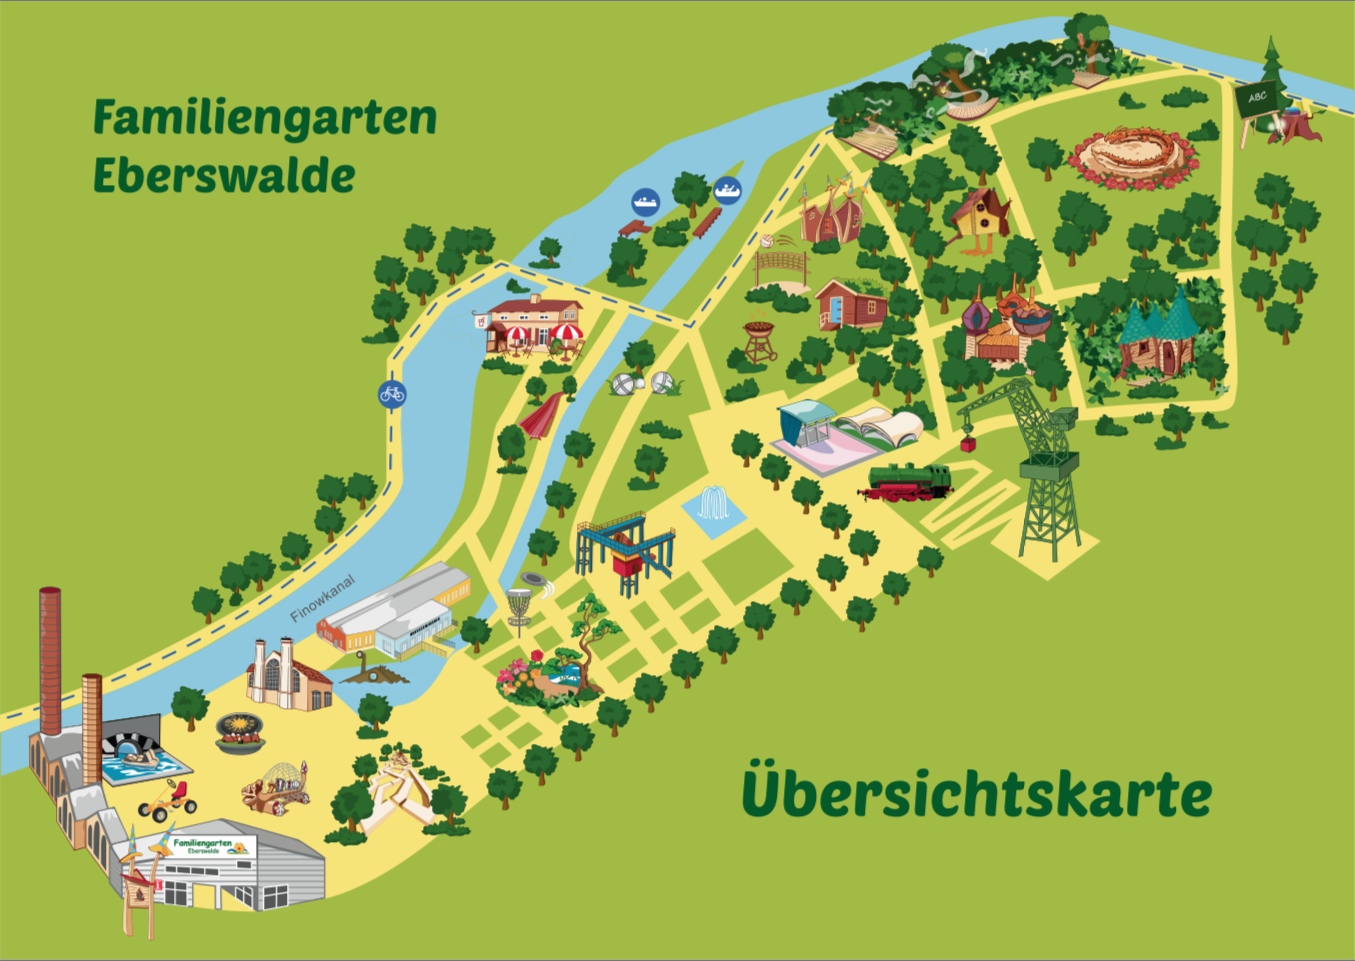 Familiengarten Eberswalde - Übersichtskarte - HD-Panorama